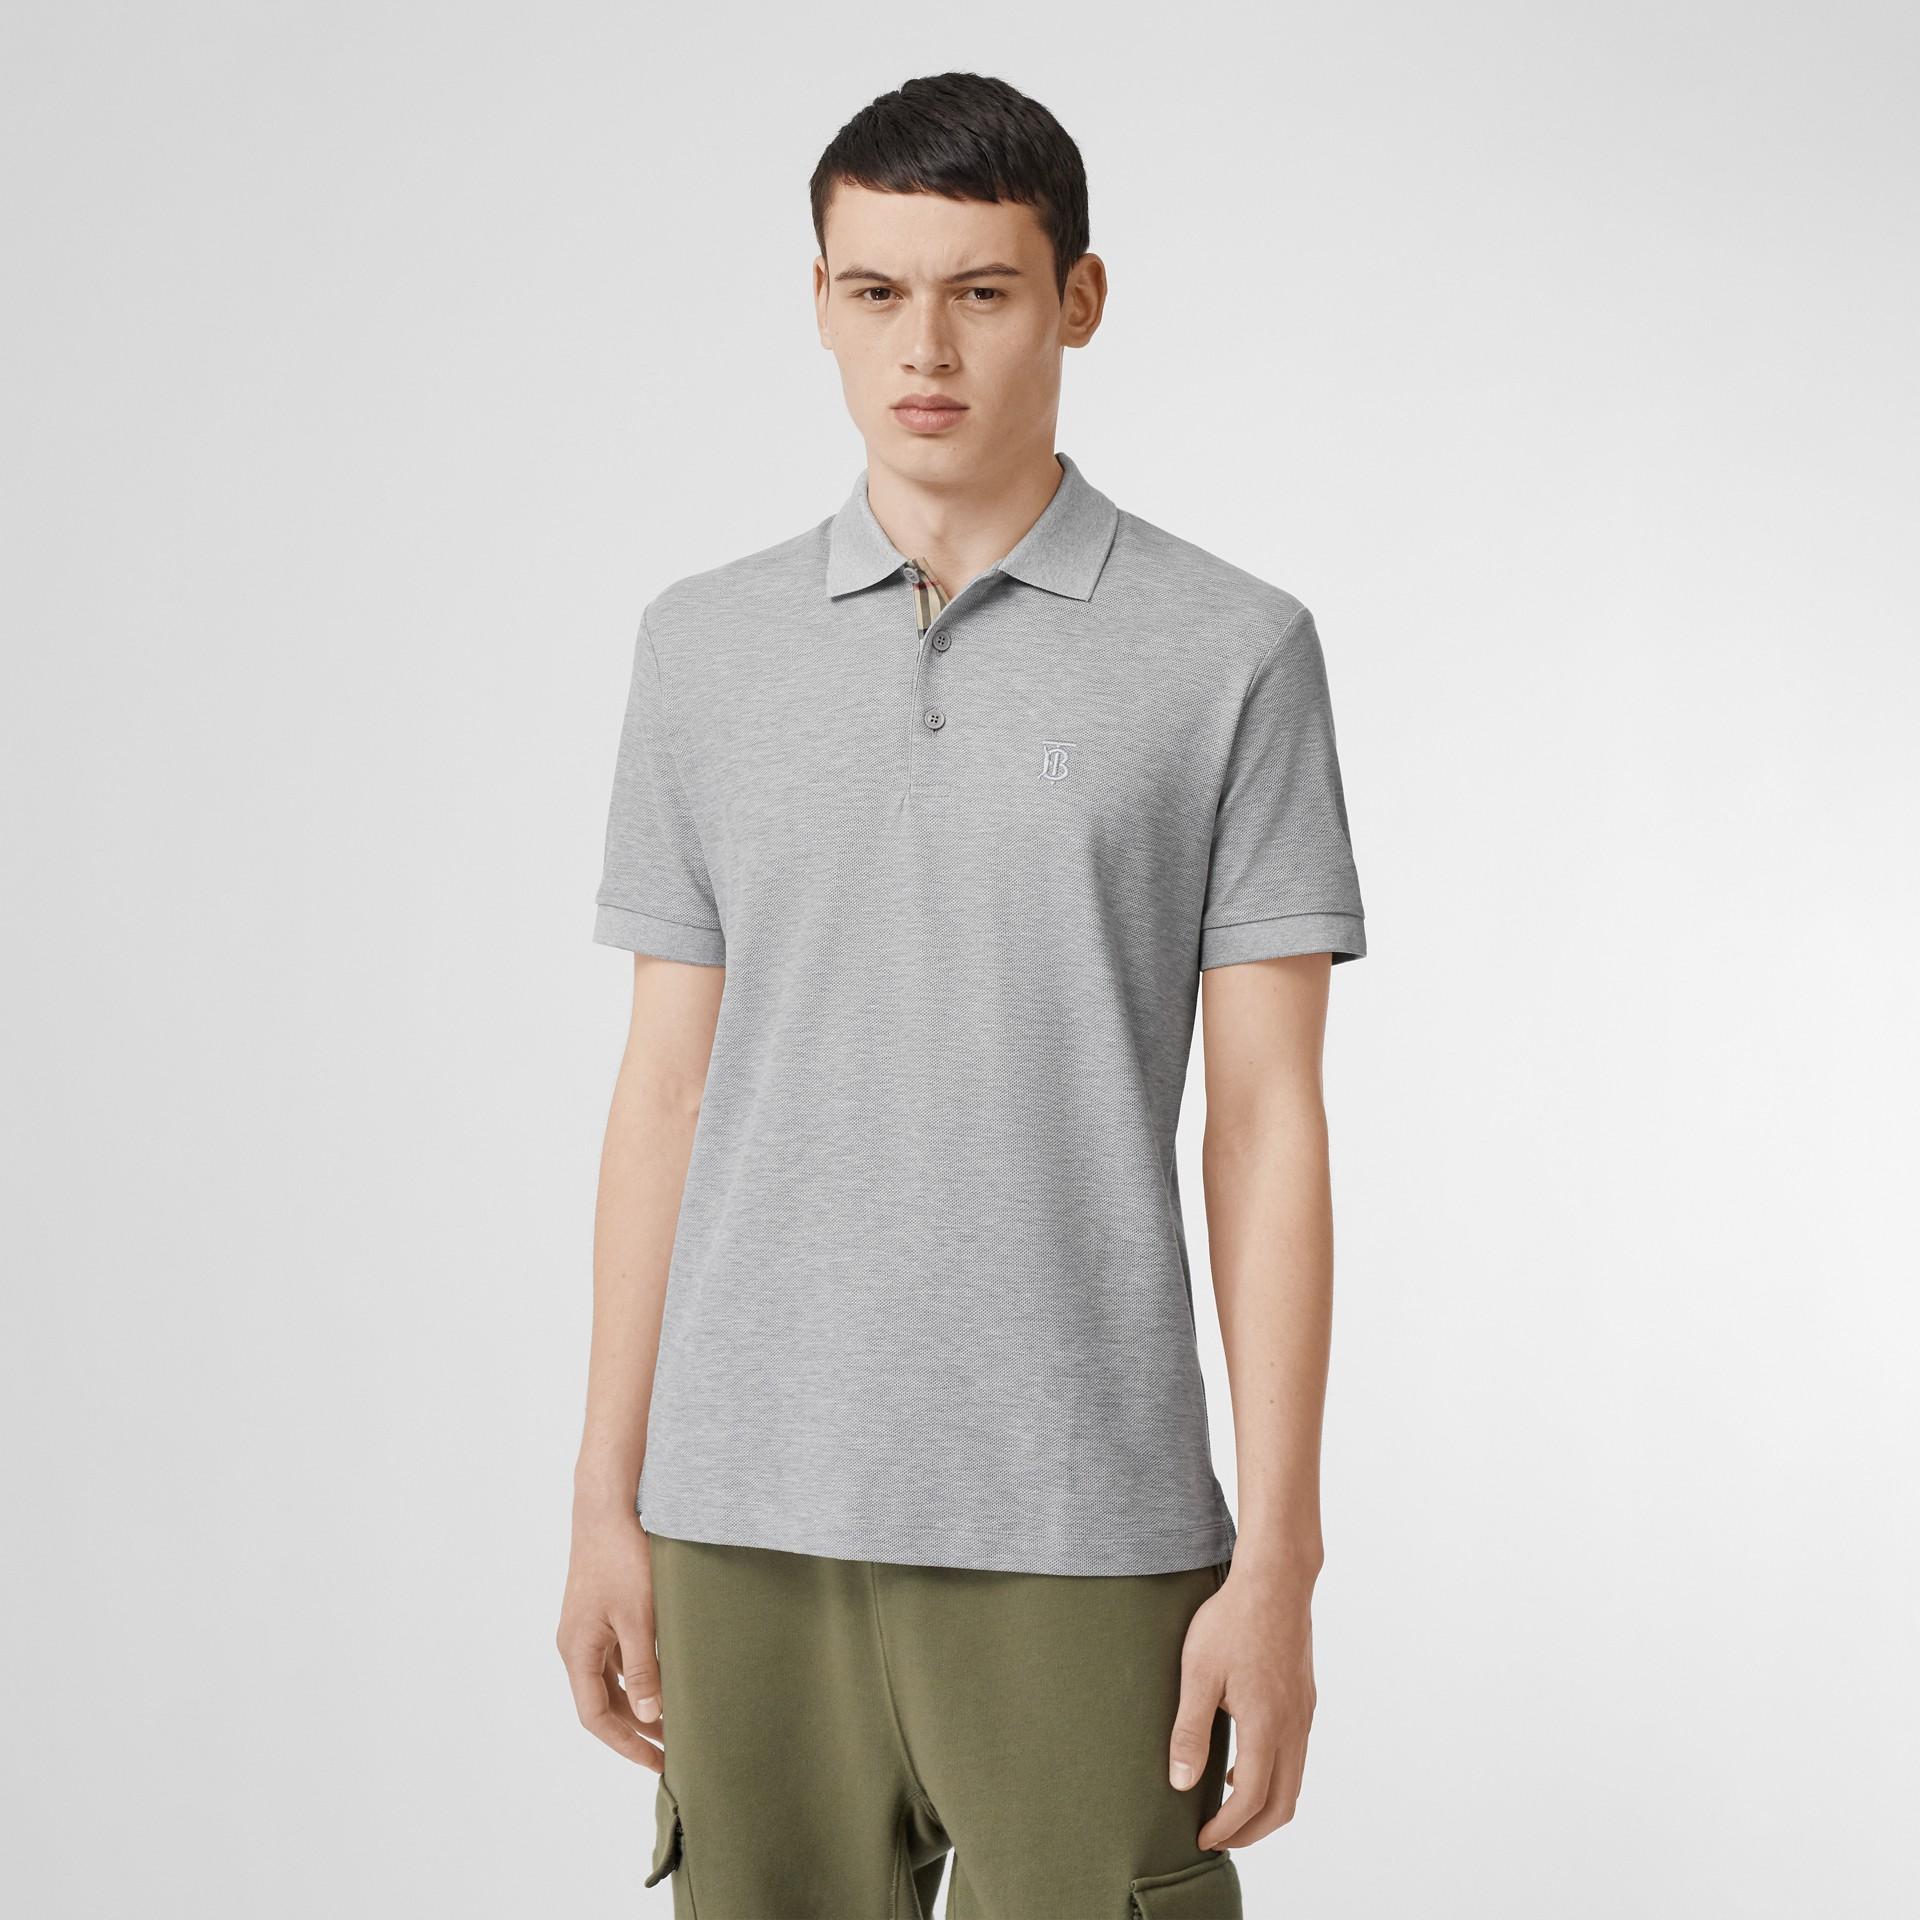 Monogram Motif Cotton Piqué Polo Shirt in White - Men | Burberry - gallery image 3